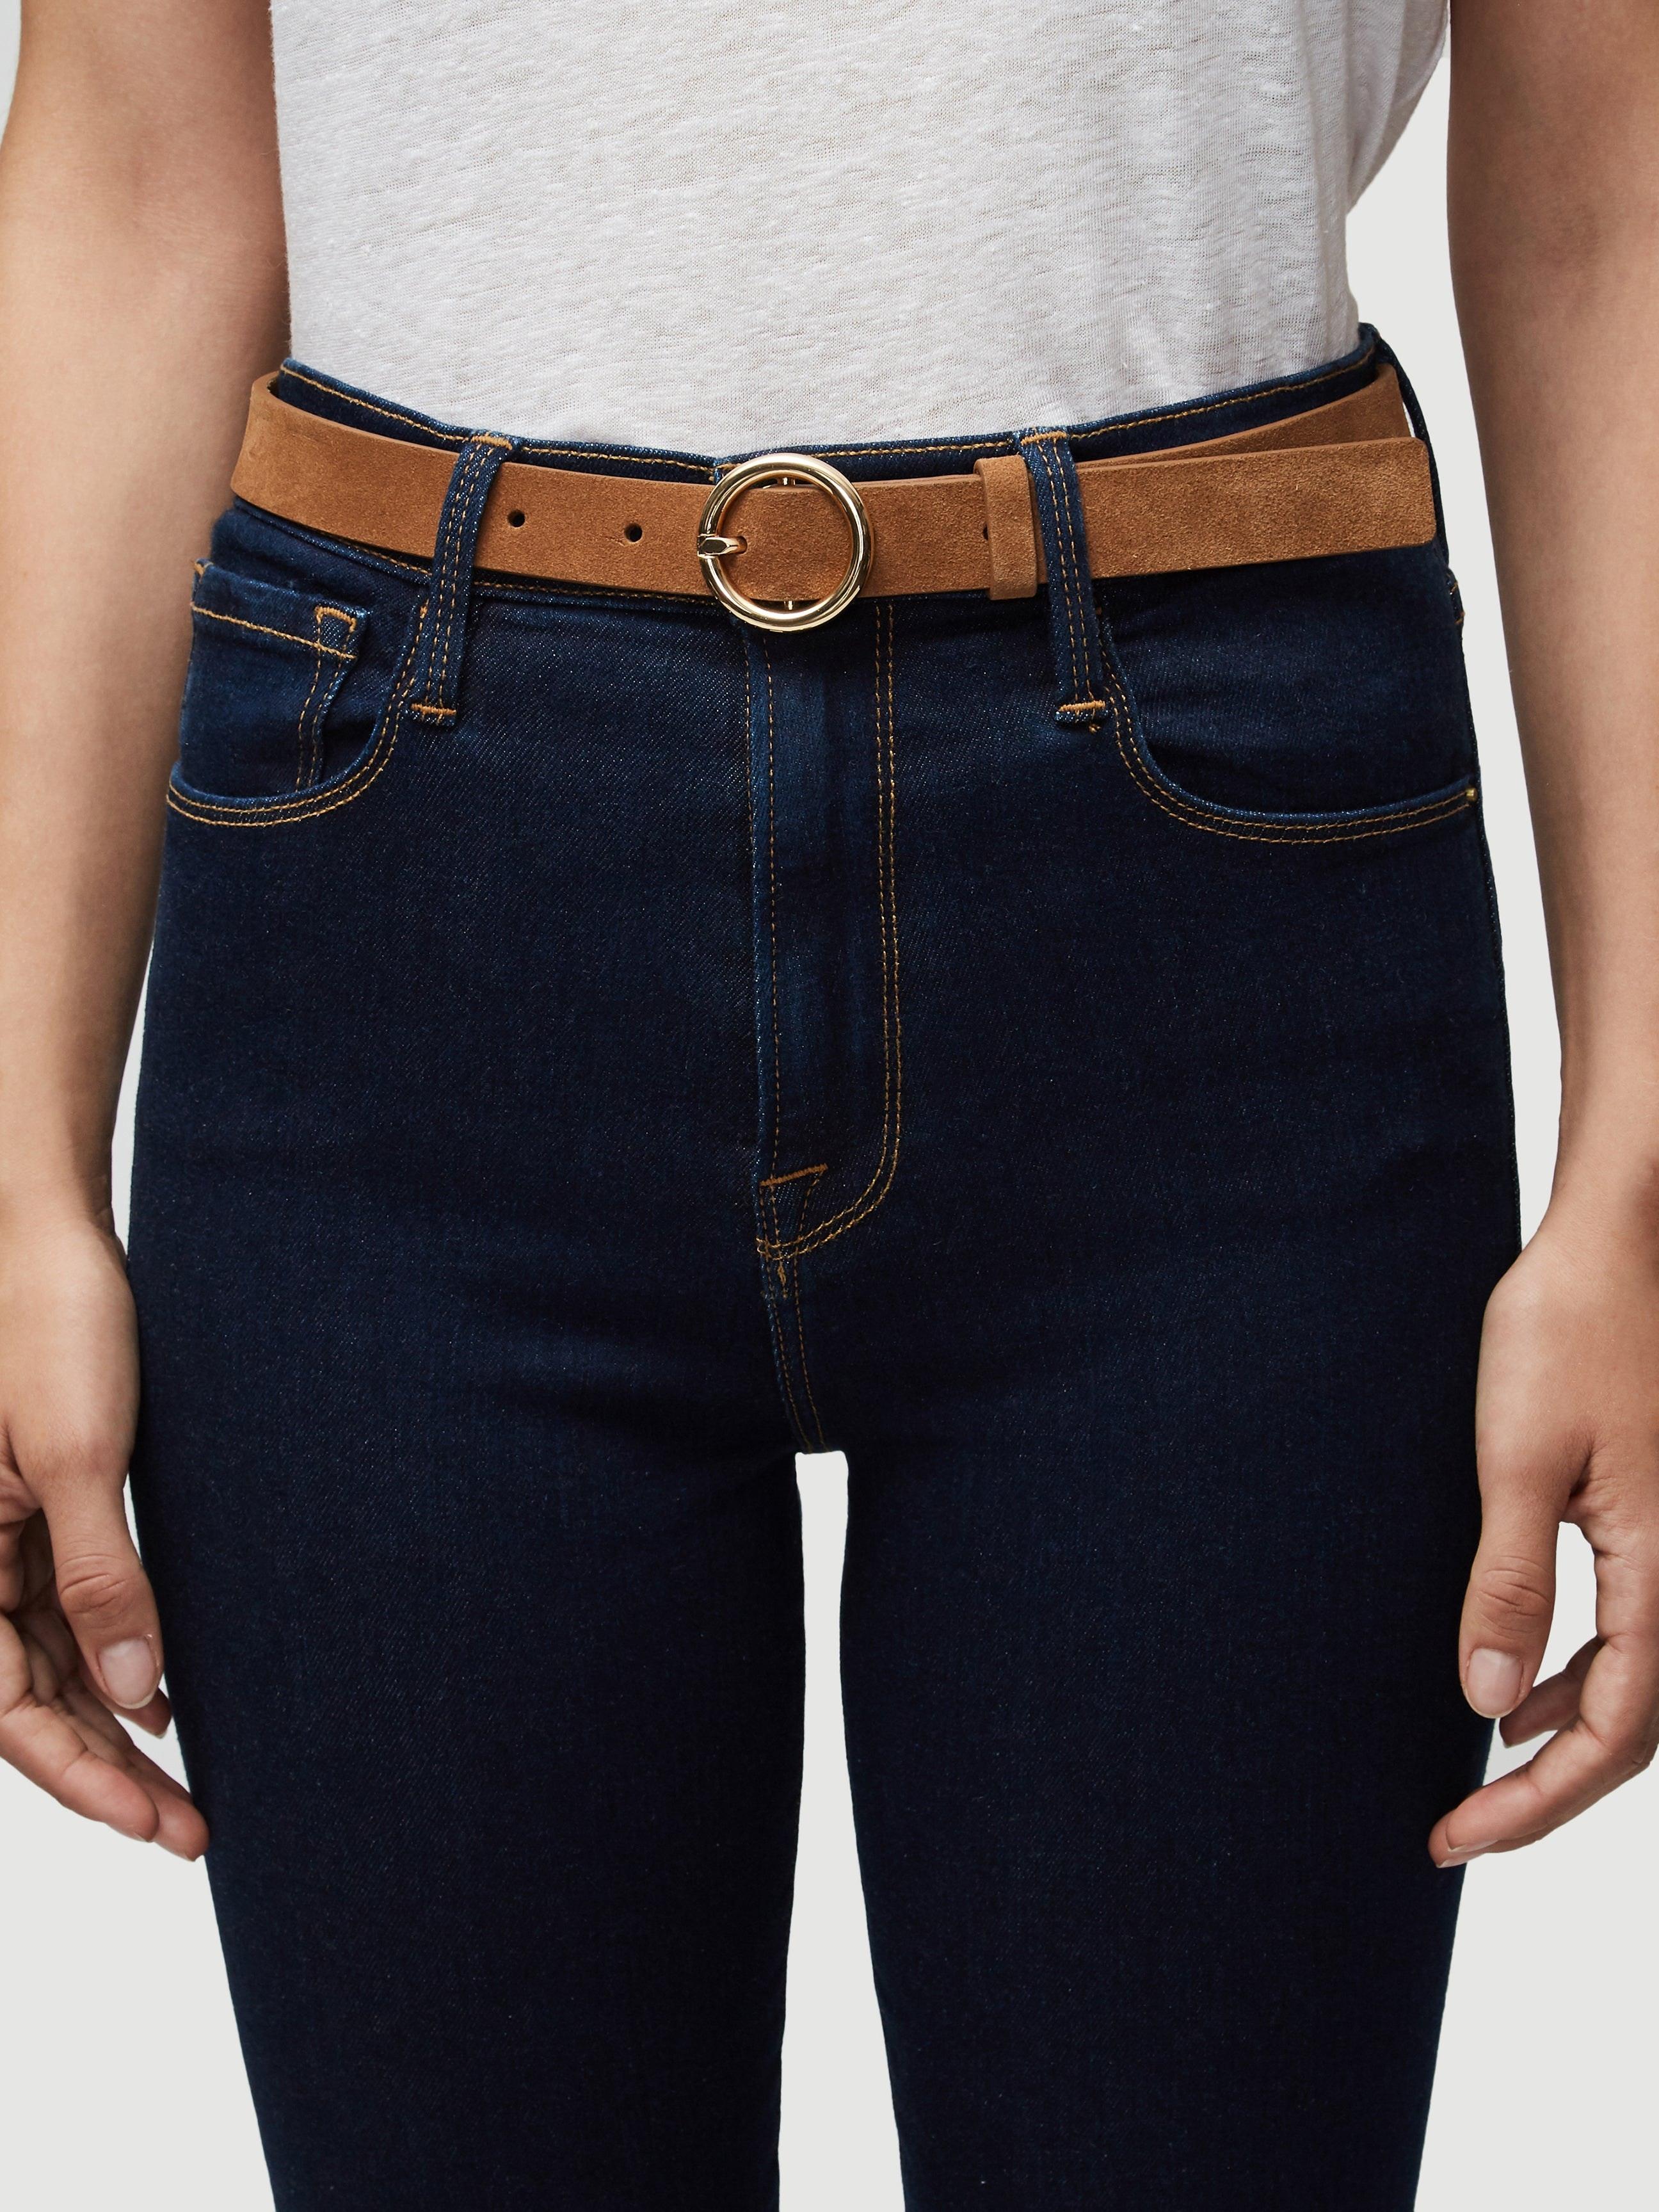 belt front view